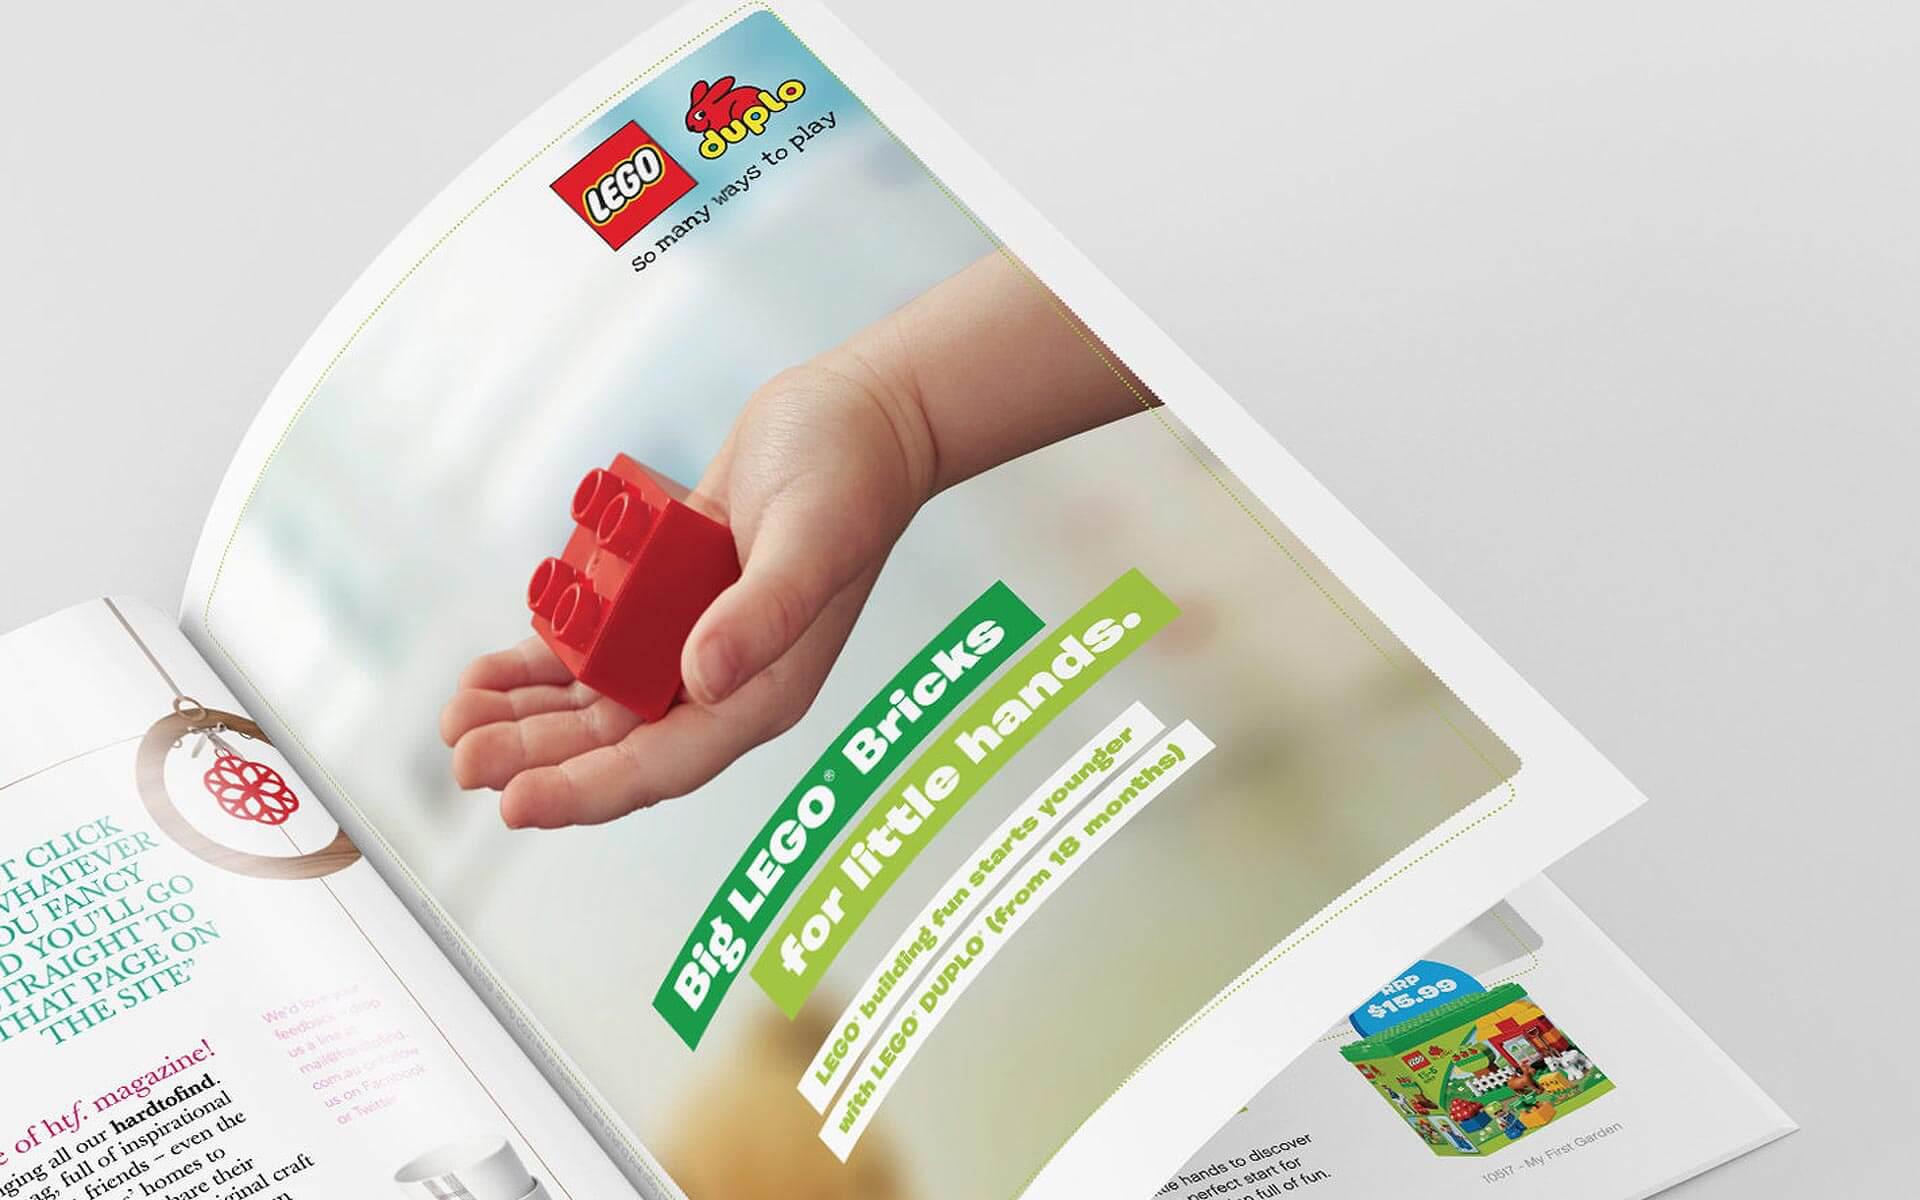 LEGO Duplo Big Bricks for Little Hand campaign graphics